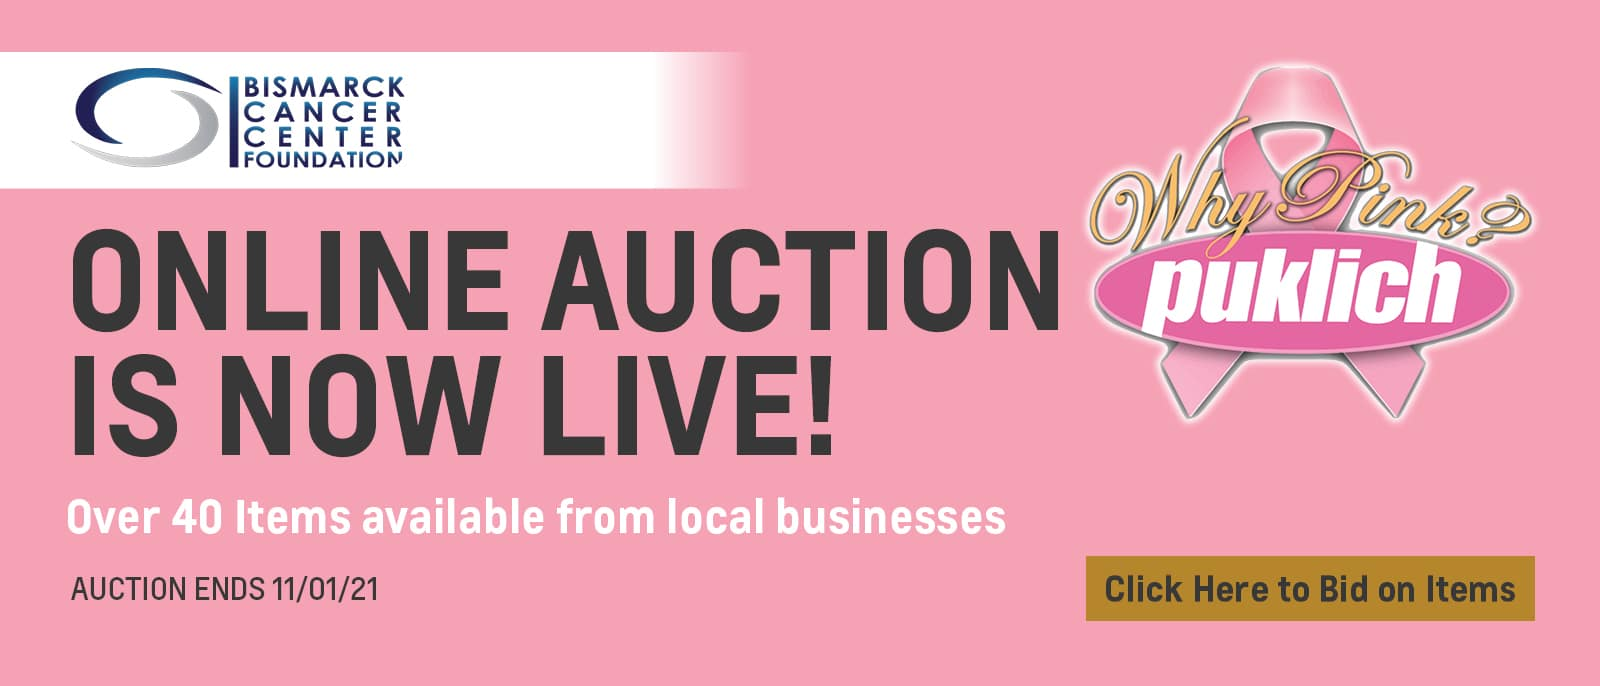 Online Auction Now Live!